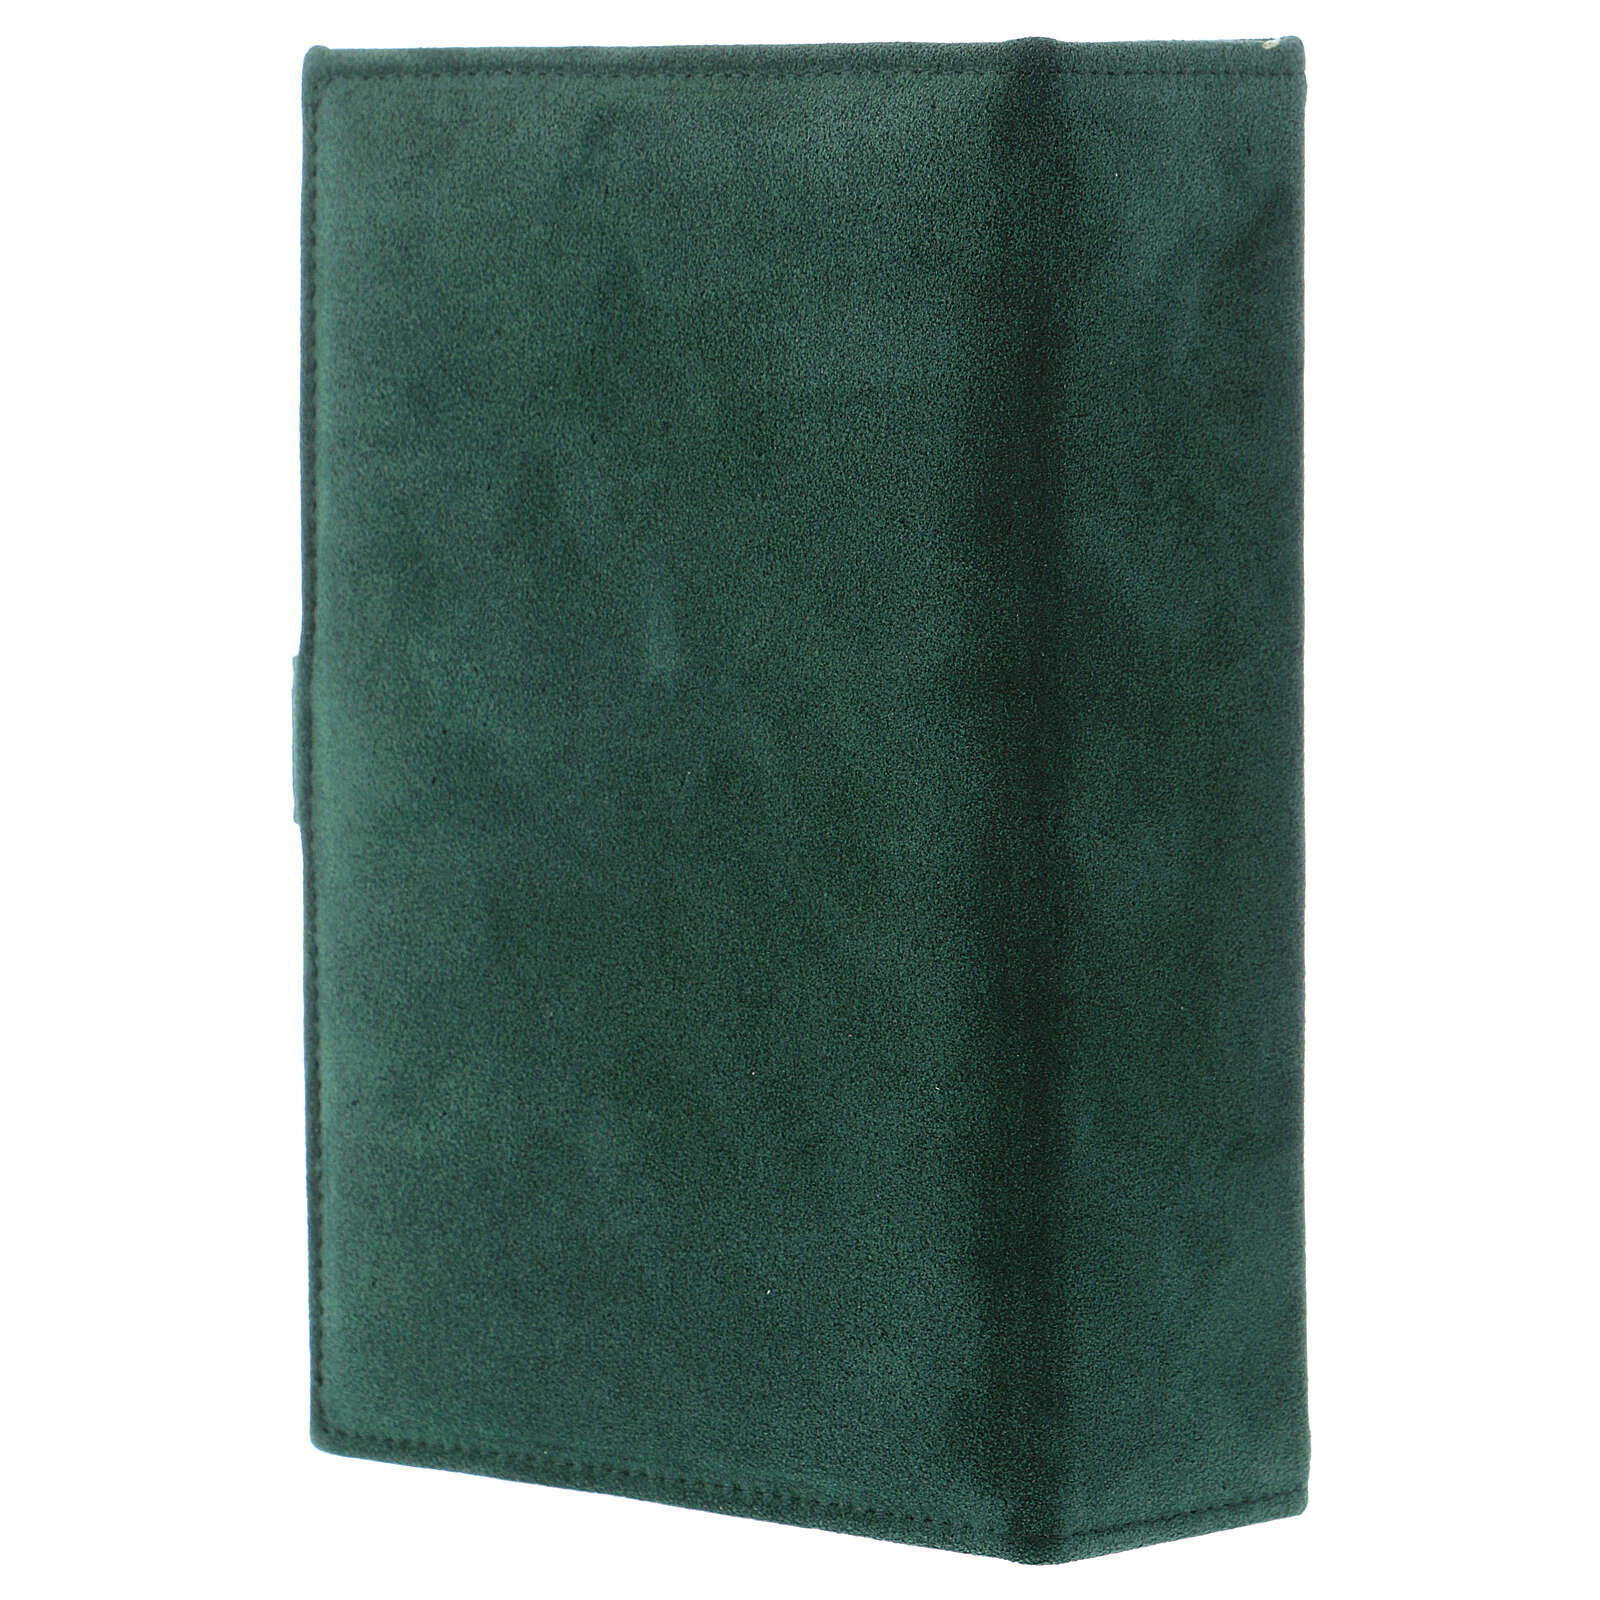 Custodia Bibbia Gerusalemme pelle scamosciata verde 4